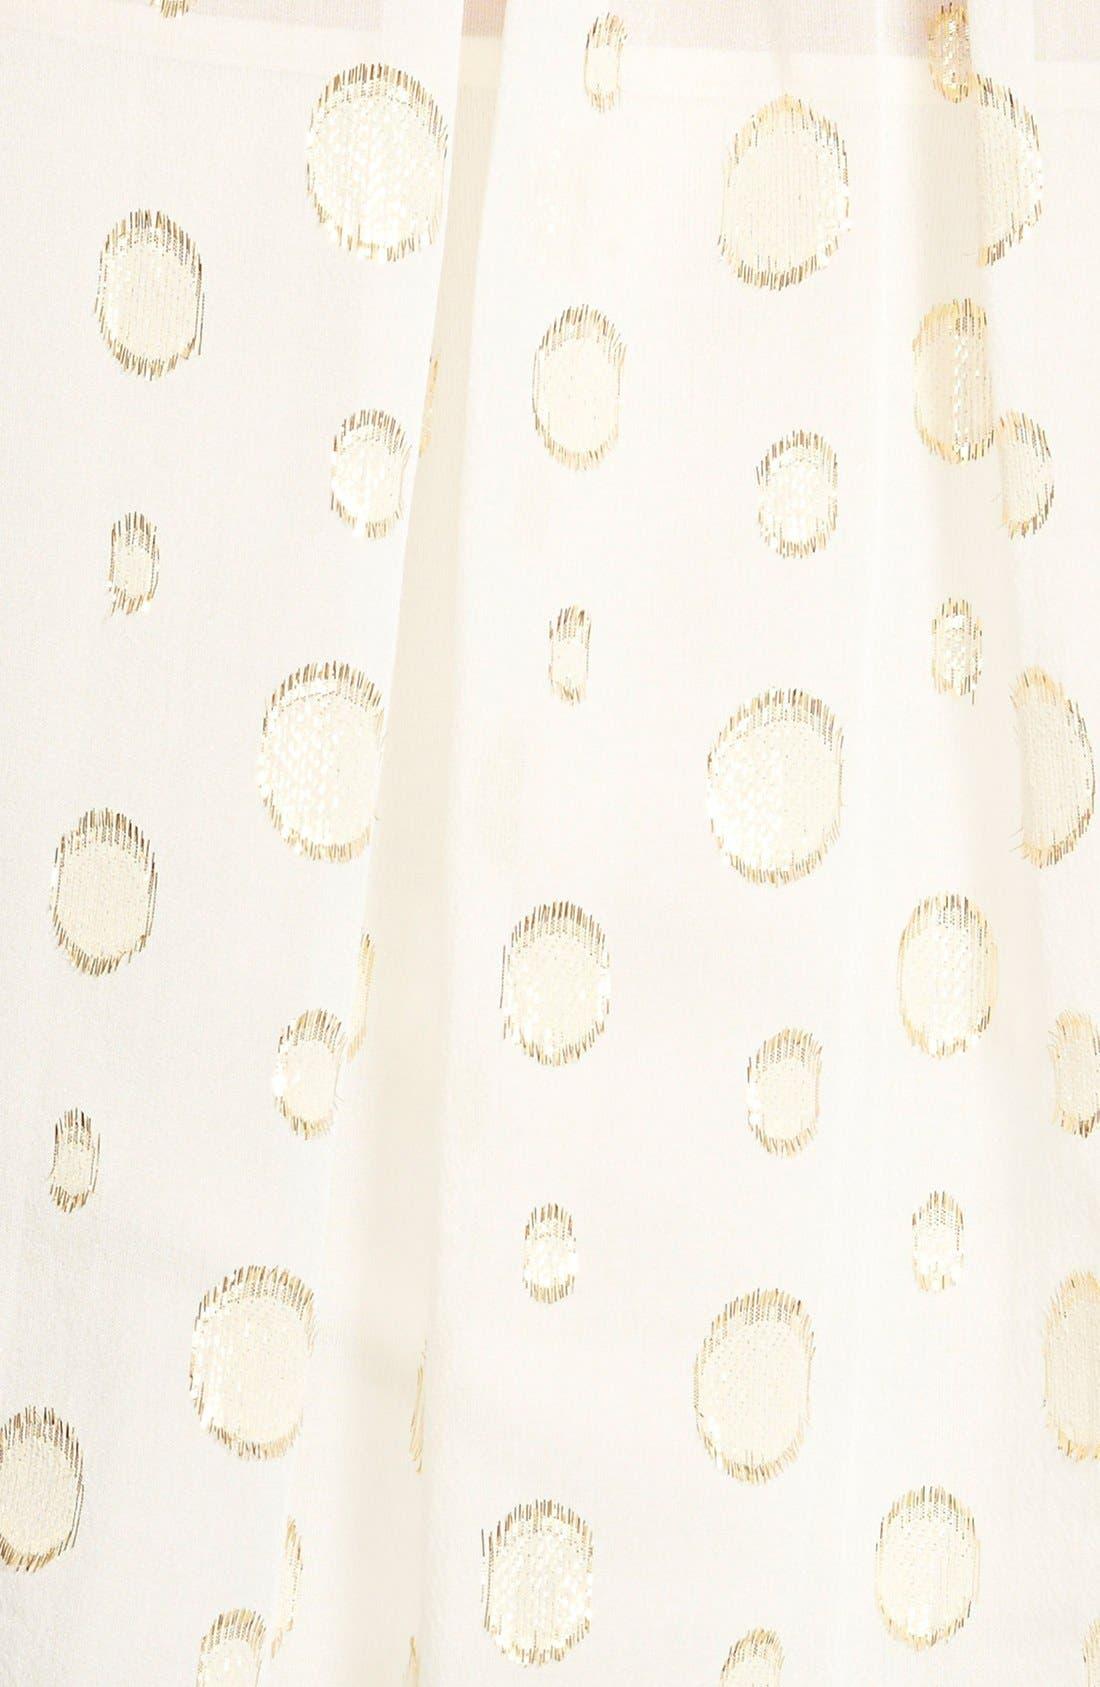 Alternate Image 3  - MICHAEL MichaelKors'Leones Spot' Print Tie Neck Blouse